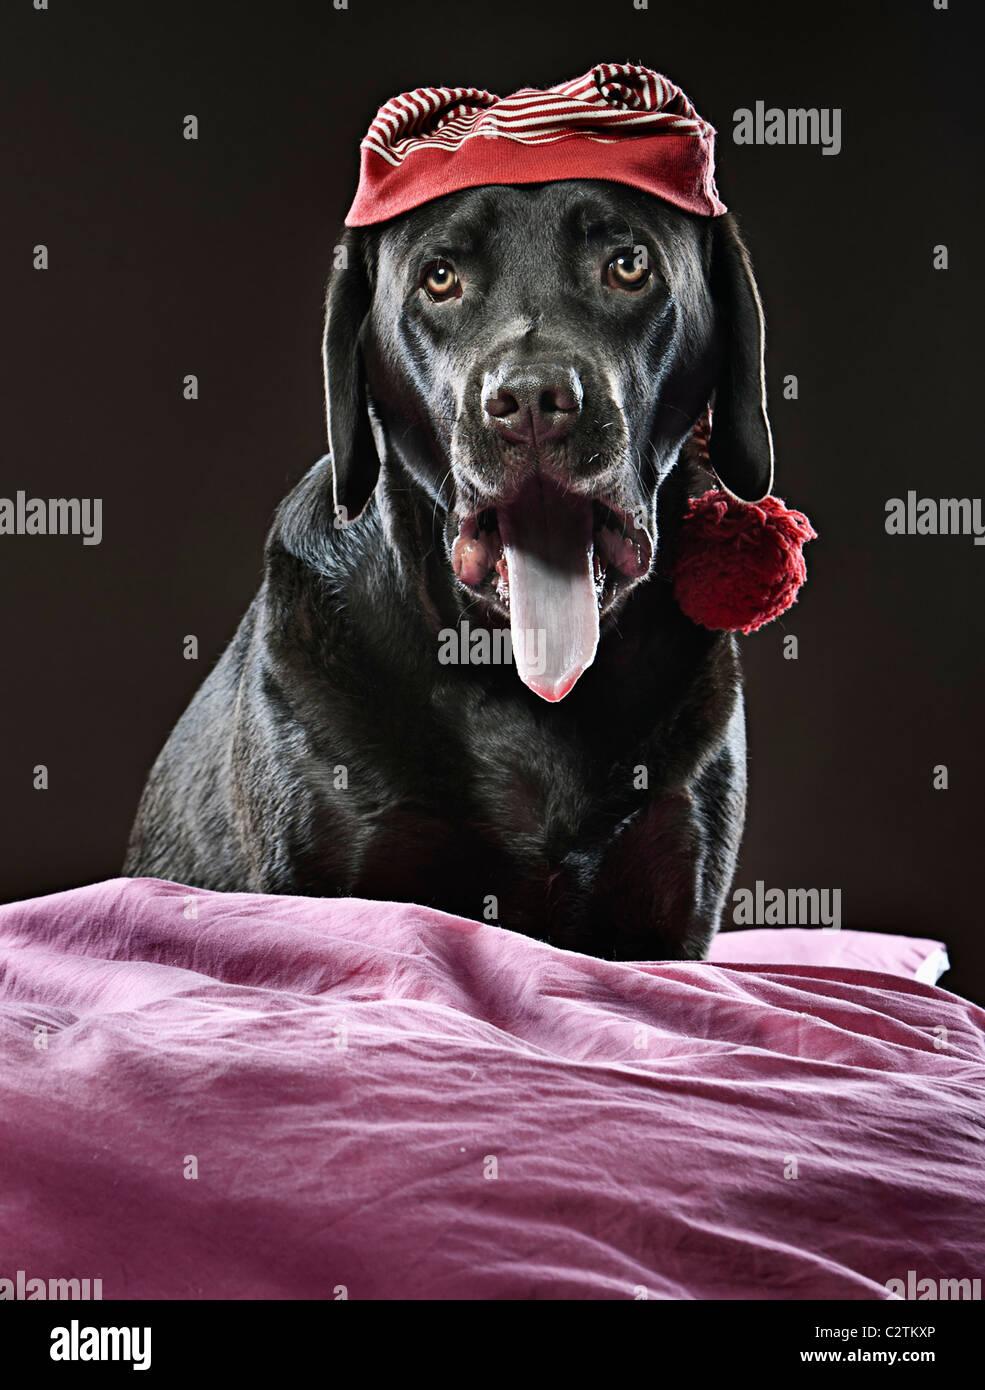 Shot of a Chocolate Labrador in Sleeping Cap, Yawning - Stock Image